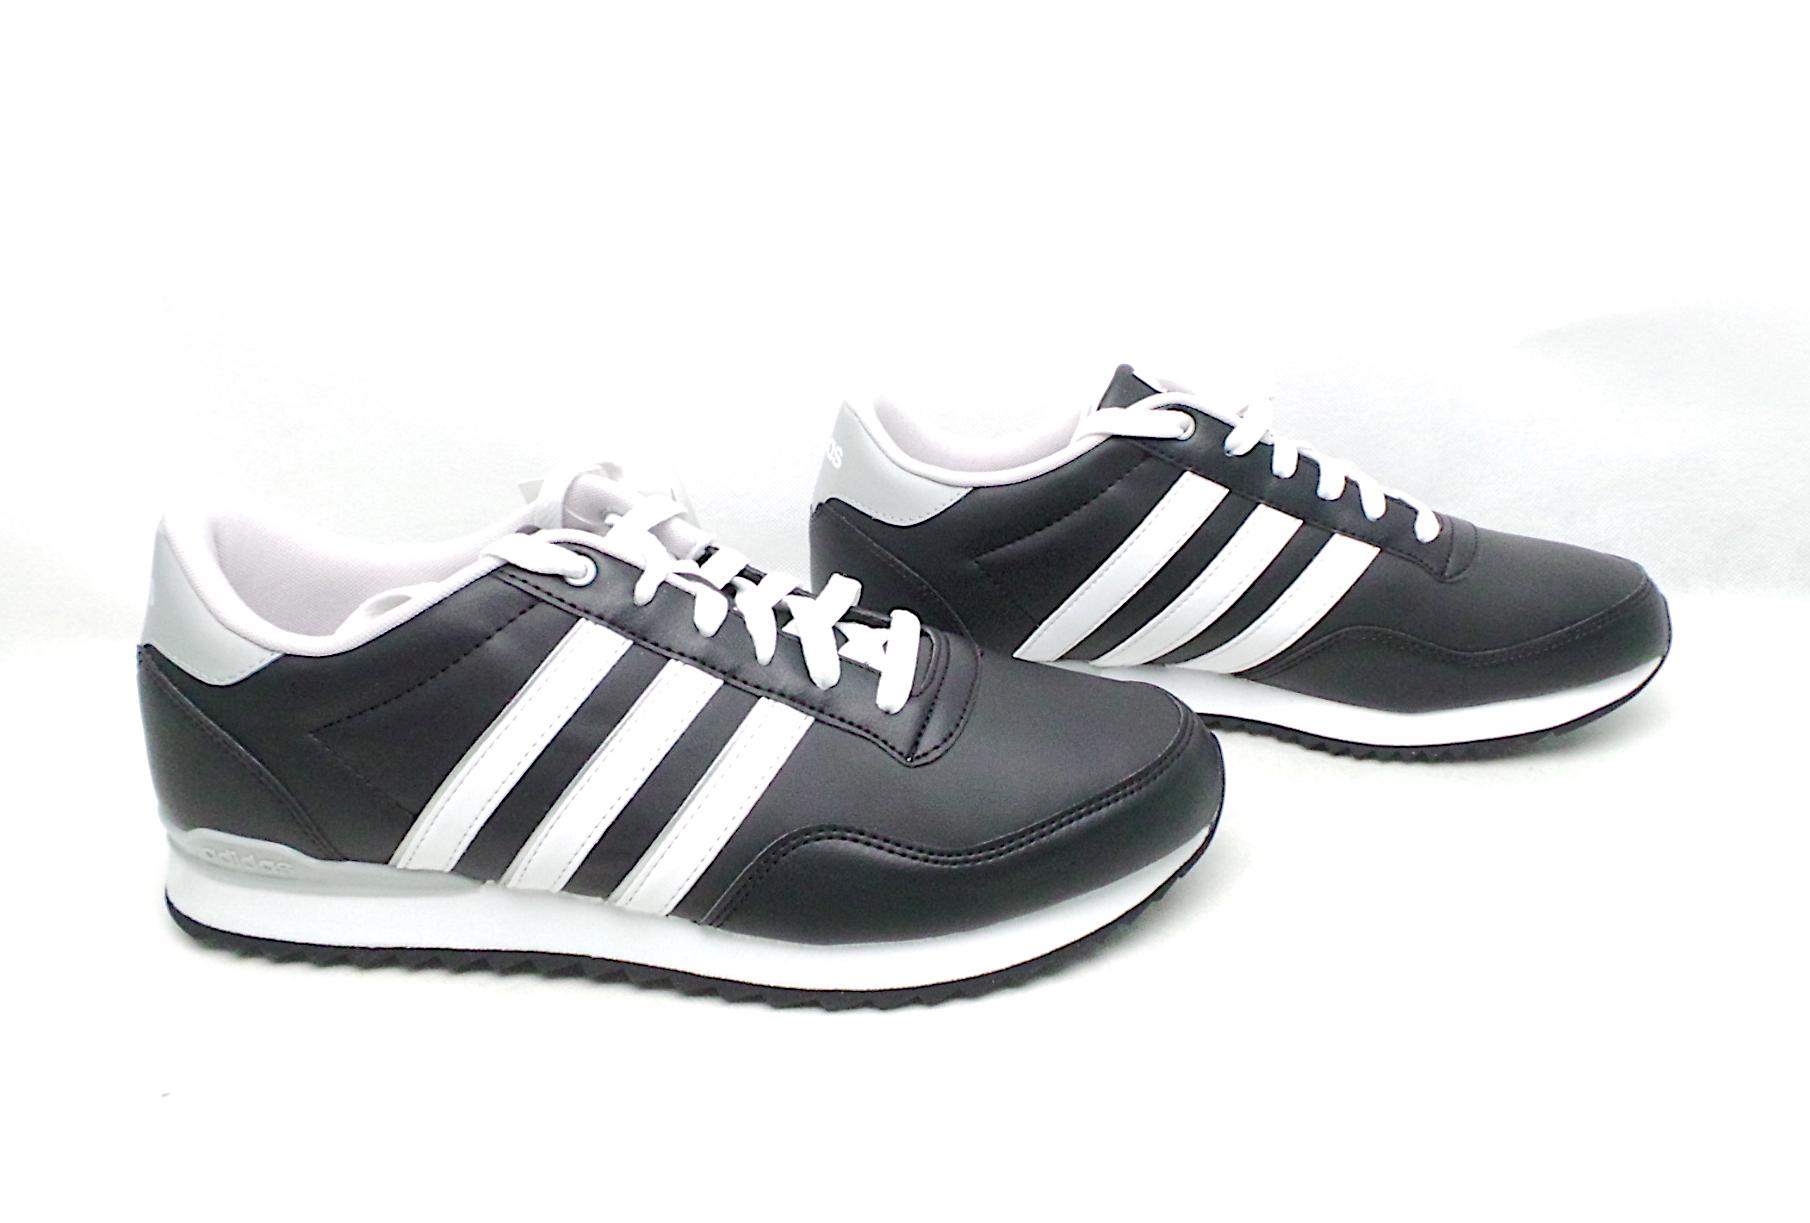 SCARPE NUMERI GRANDI delpopoloshop scarpe ADIDAS COD